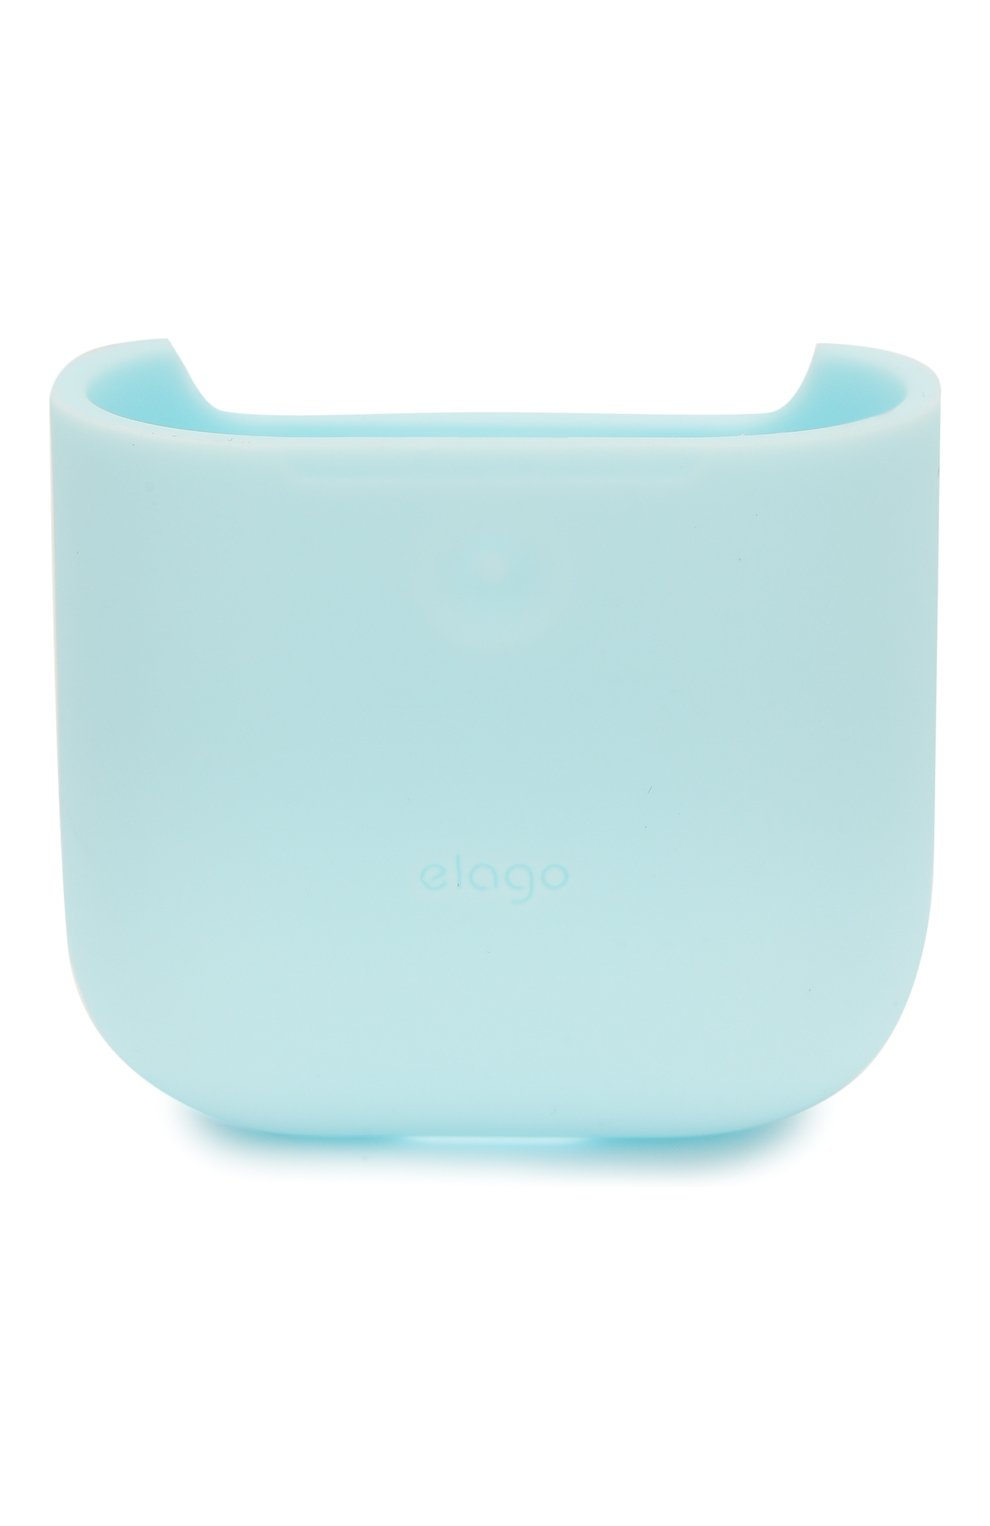 Чехол для airpods wireless ELAGO голубого цвета, арт. EAP2DO-PBL-PKWH | Фото 1 (Статус проверки: Проверена категория)